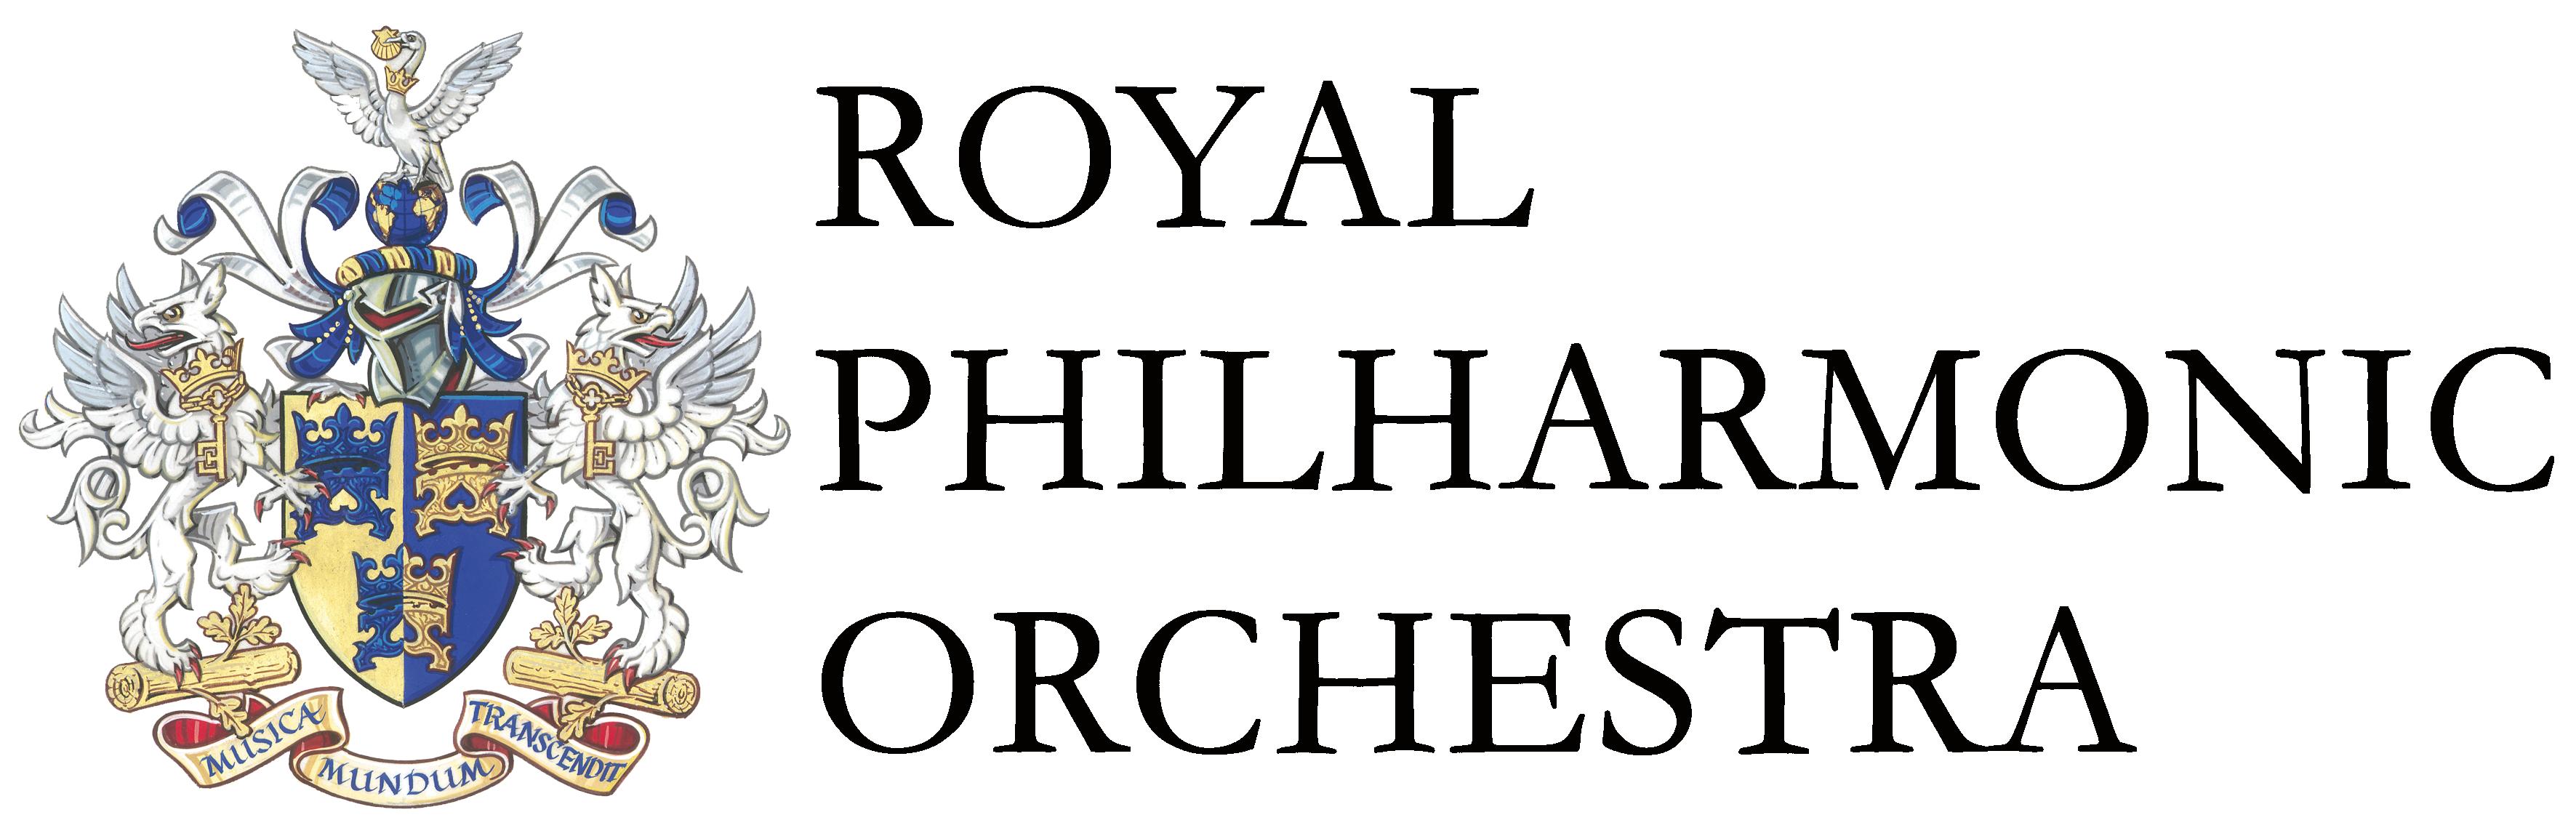 Royal Philharmonic Orchestra logo 2018